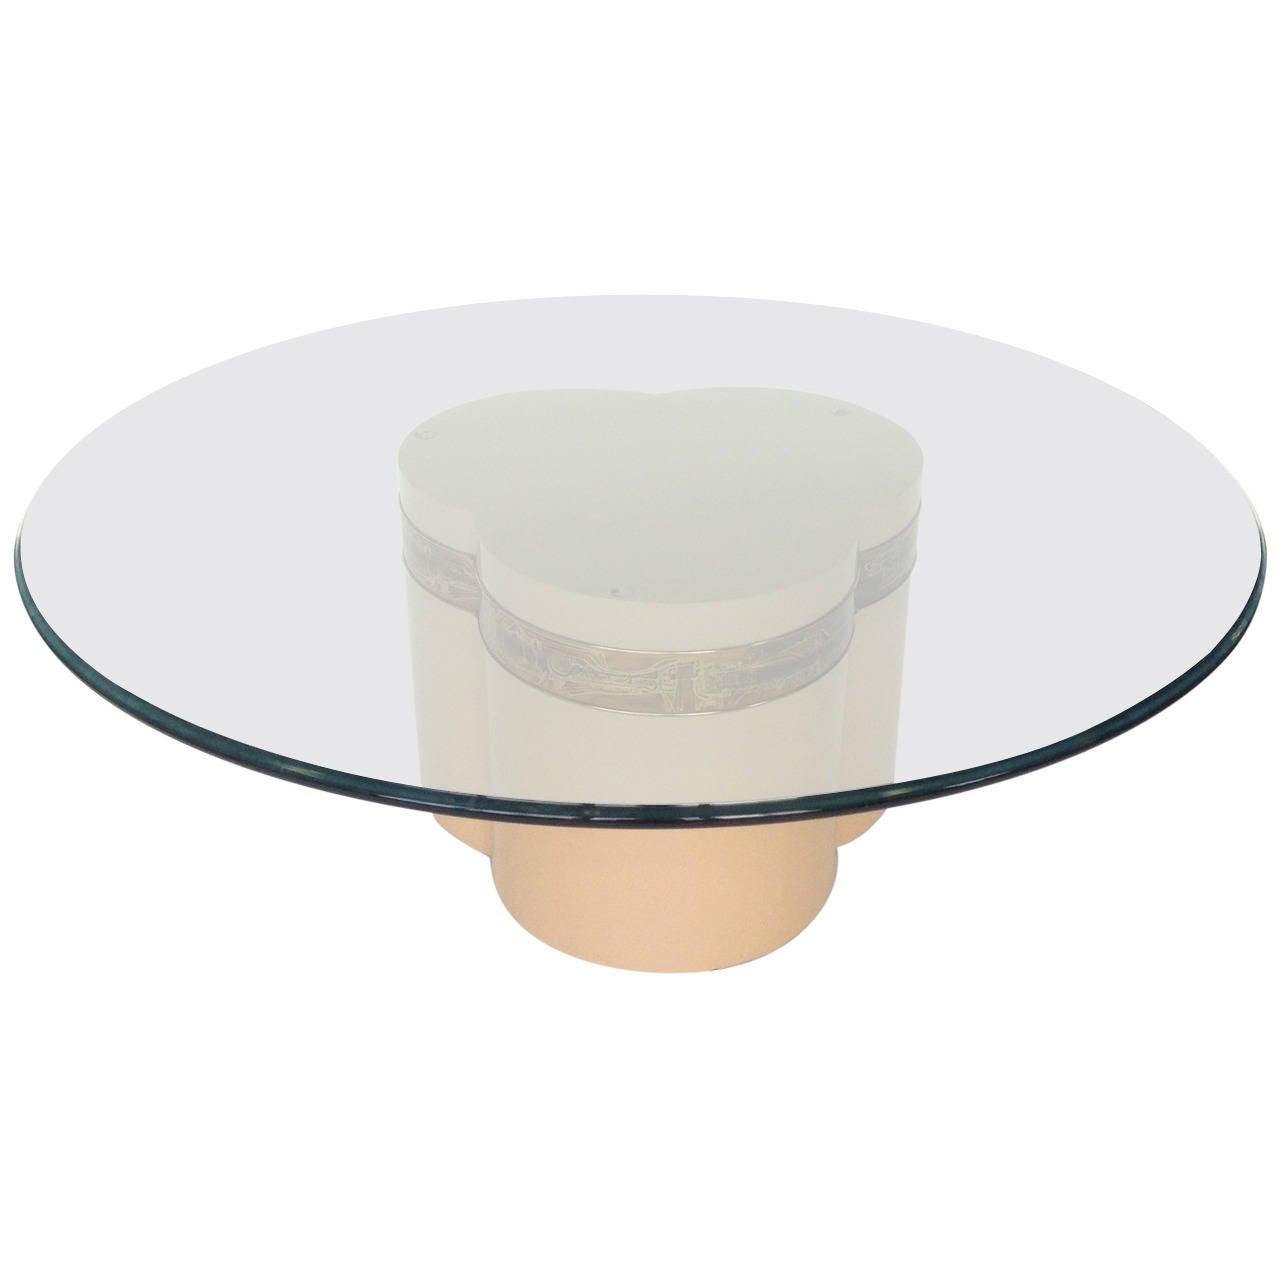 Mastercraft Coffee Table Designed by Bernard Rohne